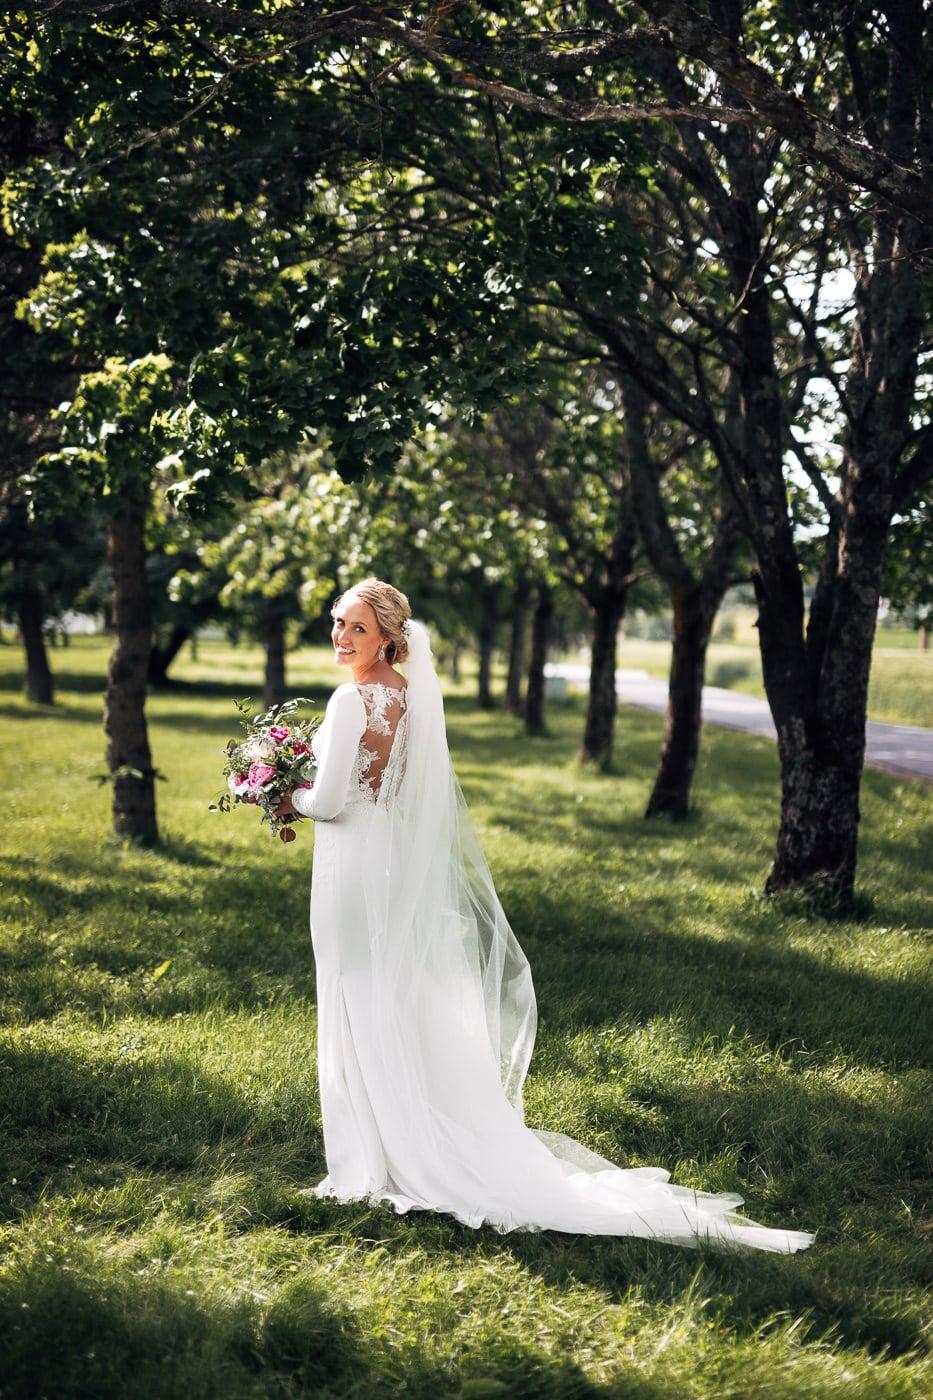 Karoline & Andreas - bryllup i Østfold med magiske detaljer Bryllup Fredrikstad Fotograf 55